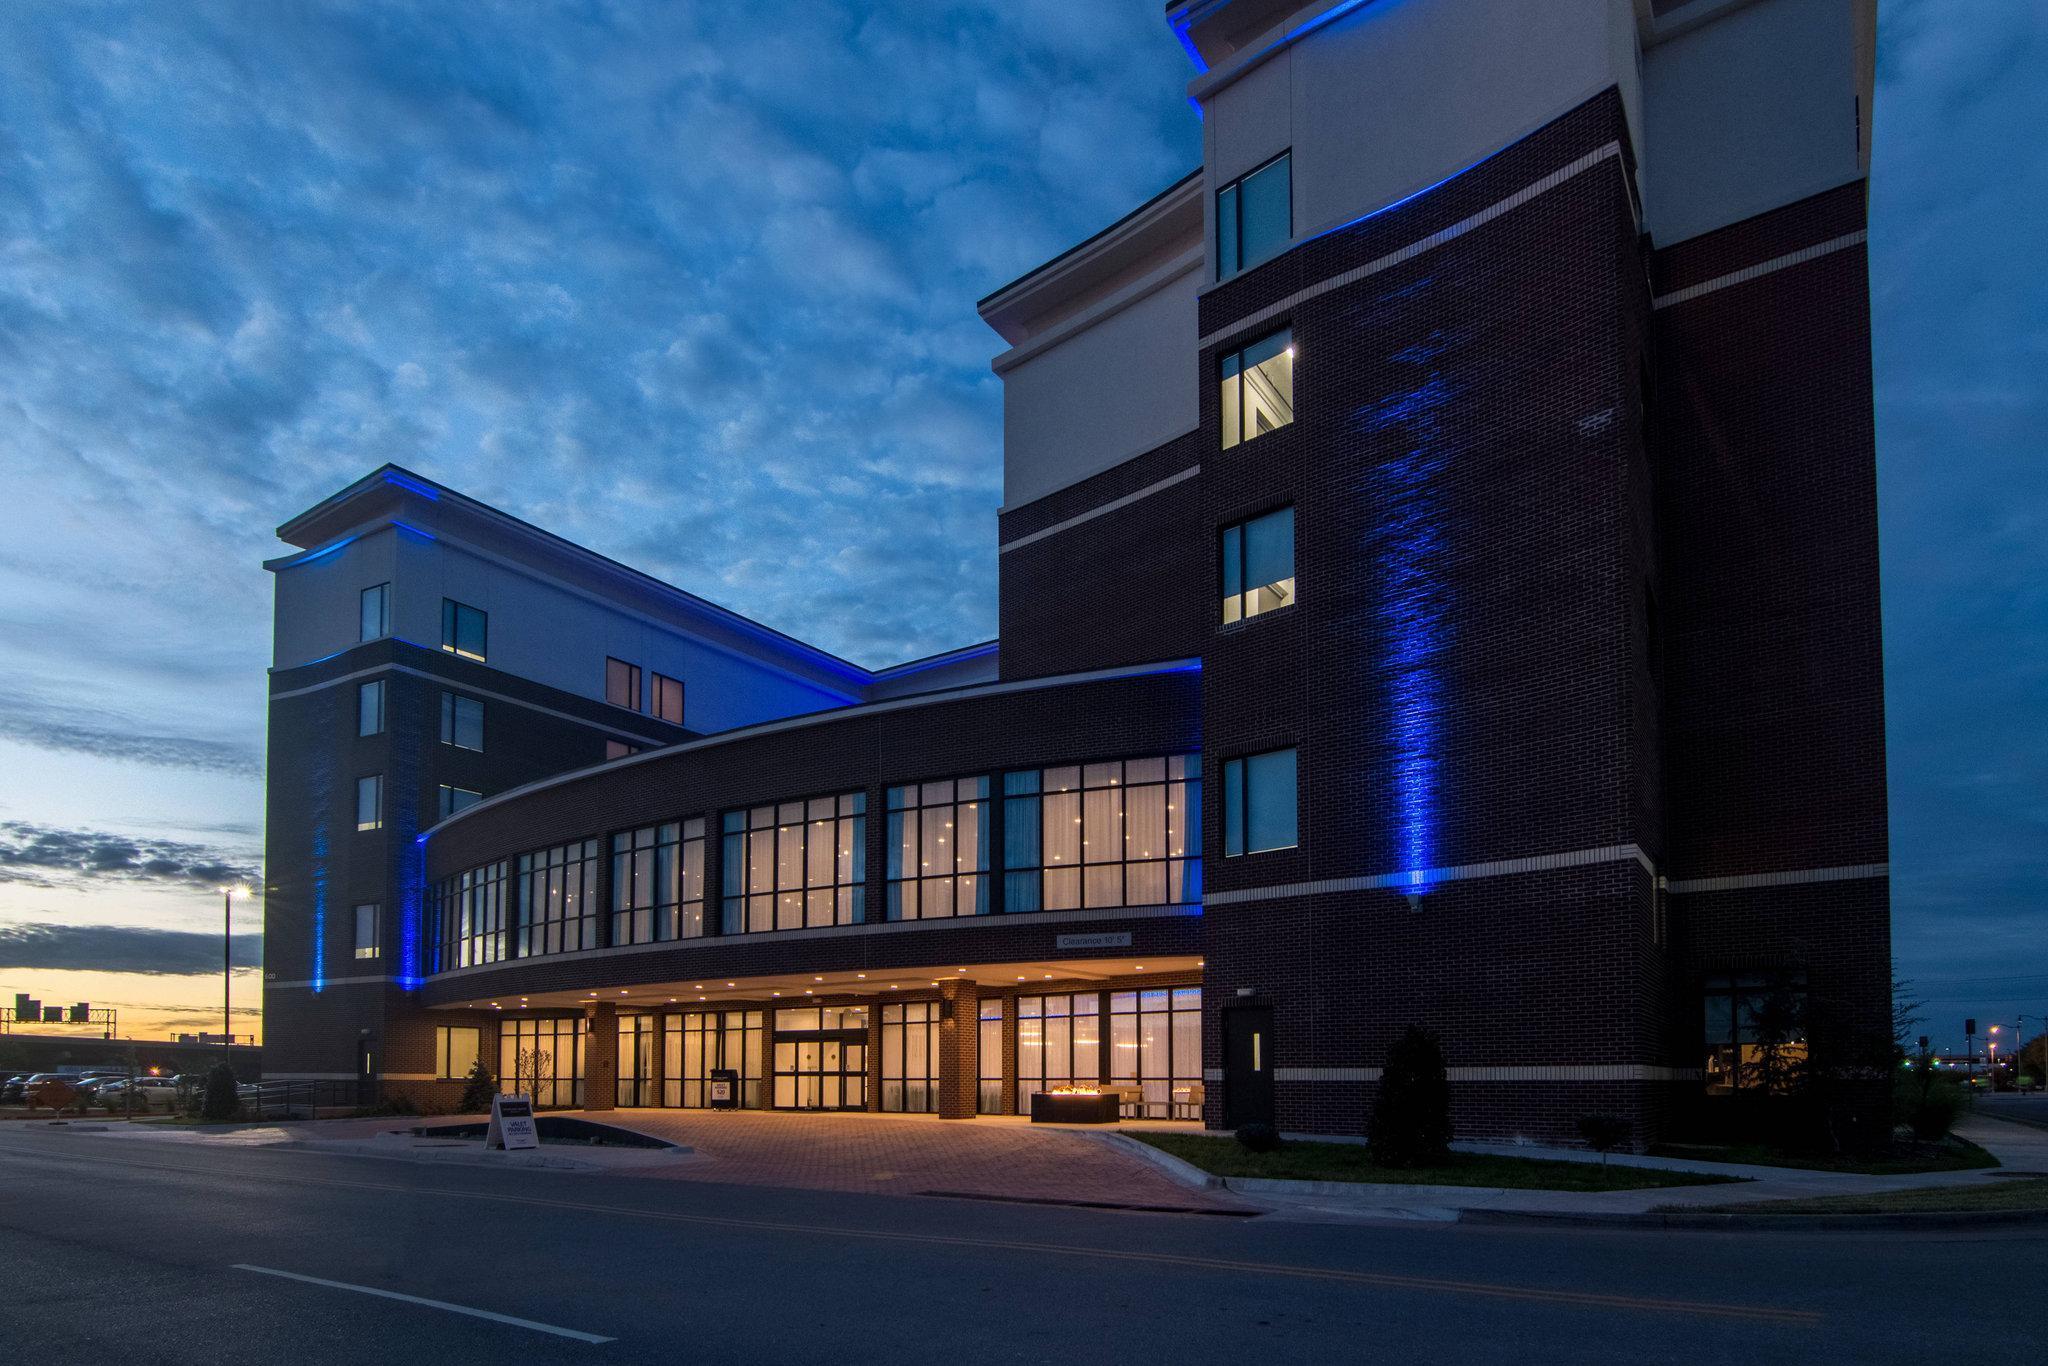 SpringHill Suites Oklahoma City Downtown Bricktown